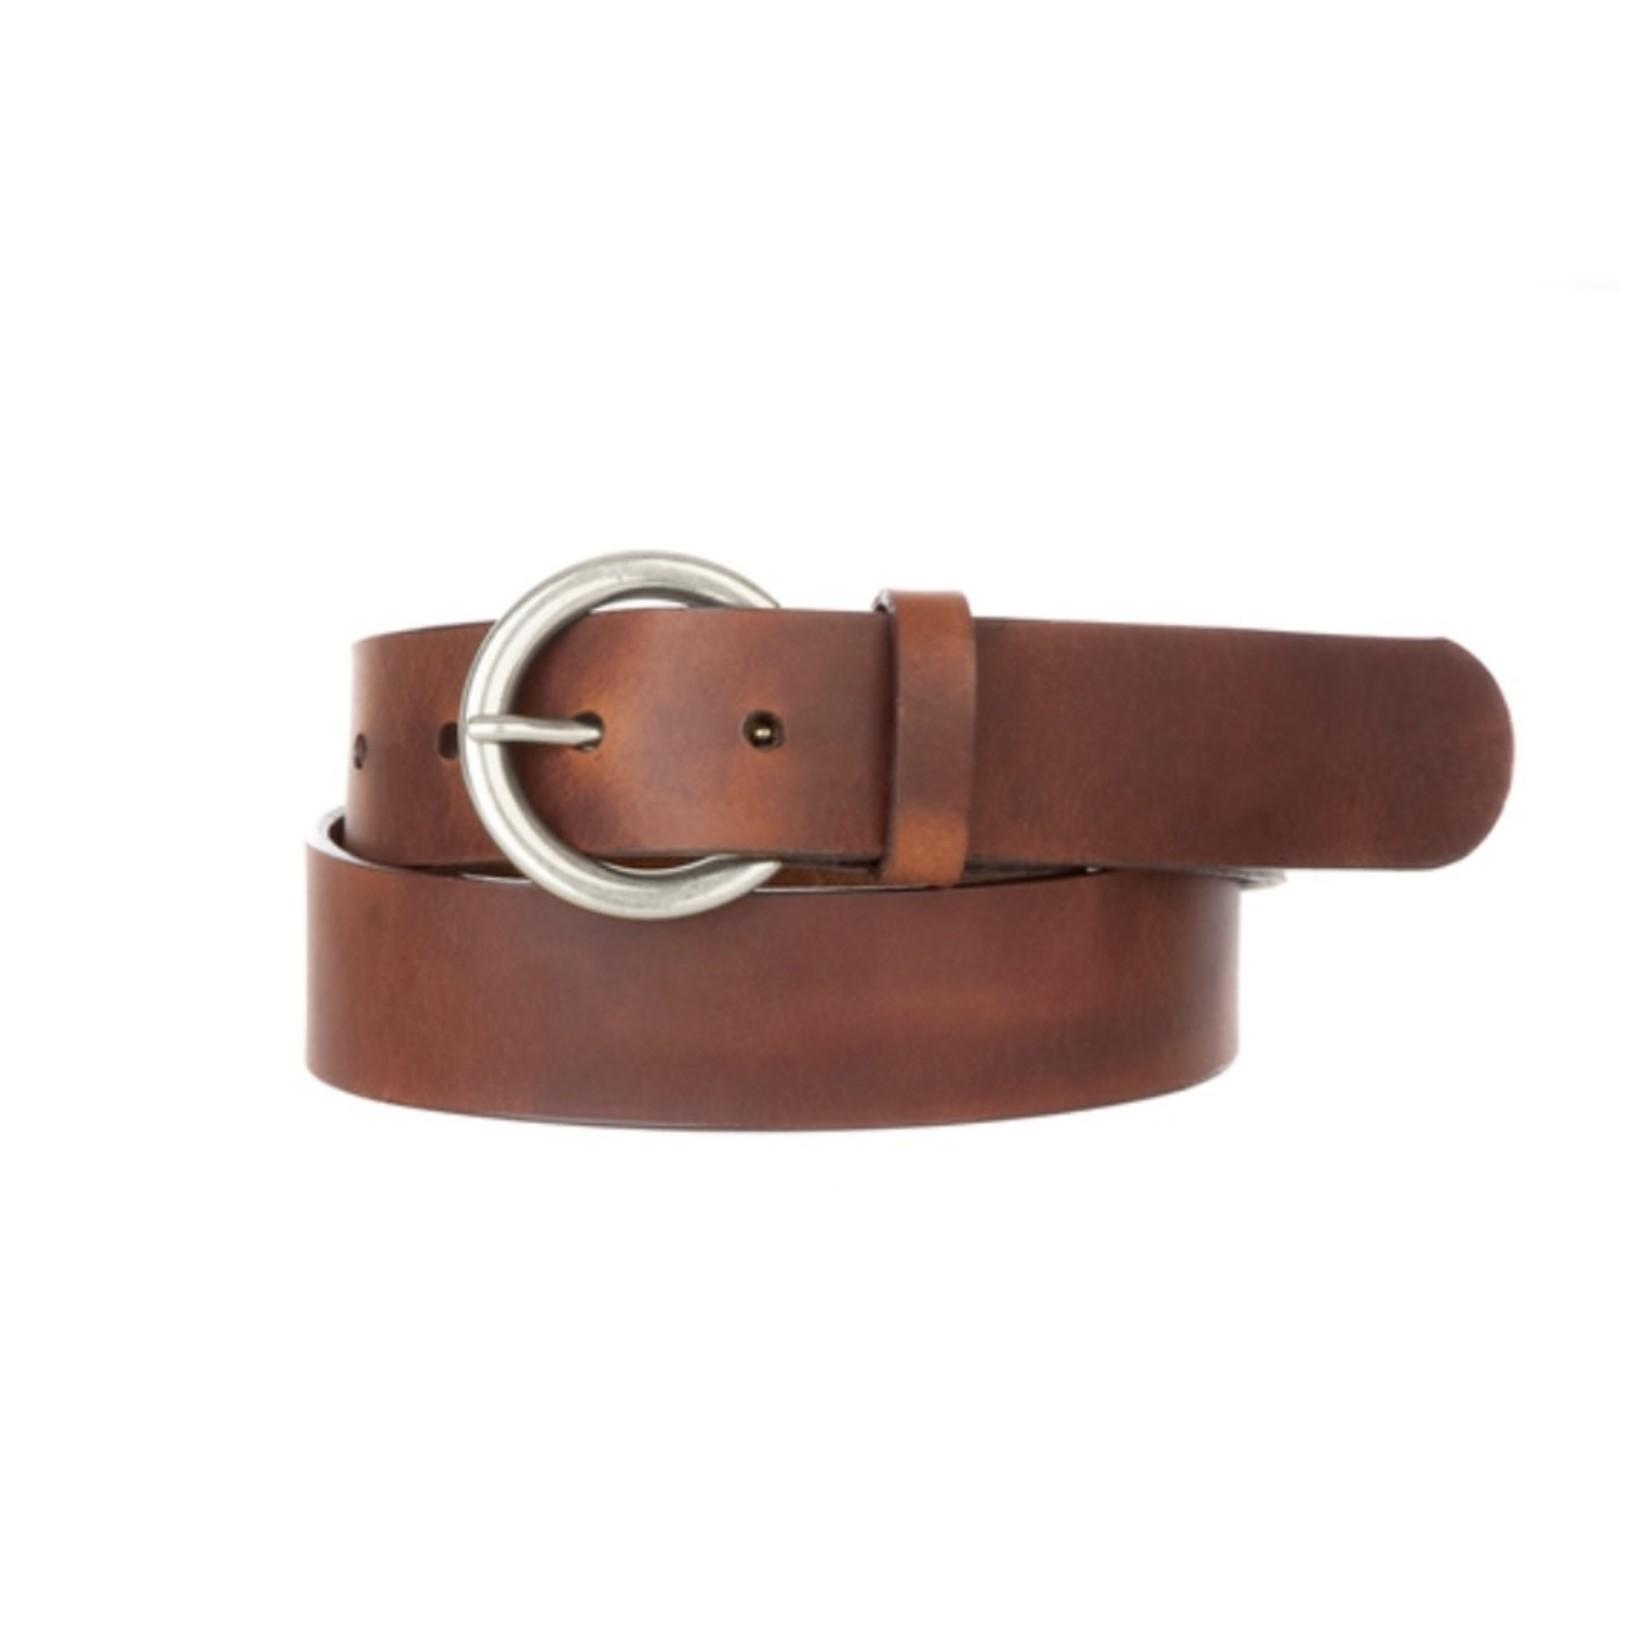 Brave Leather Leather Belt